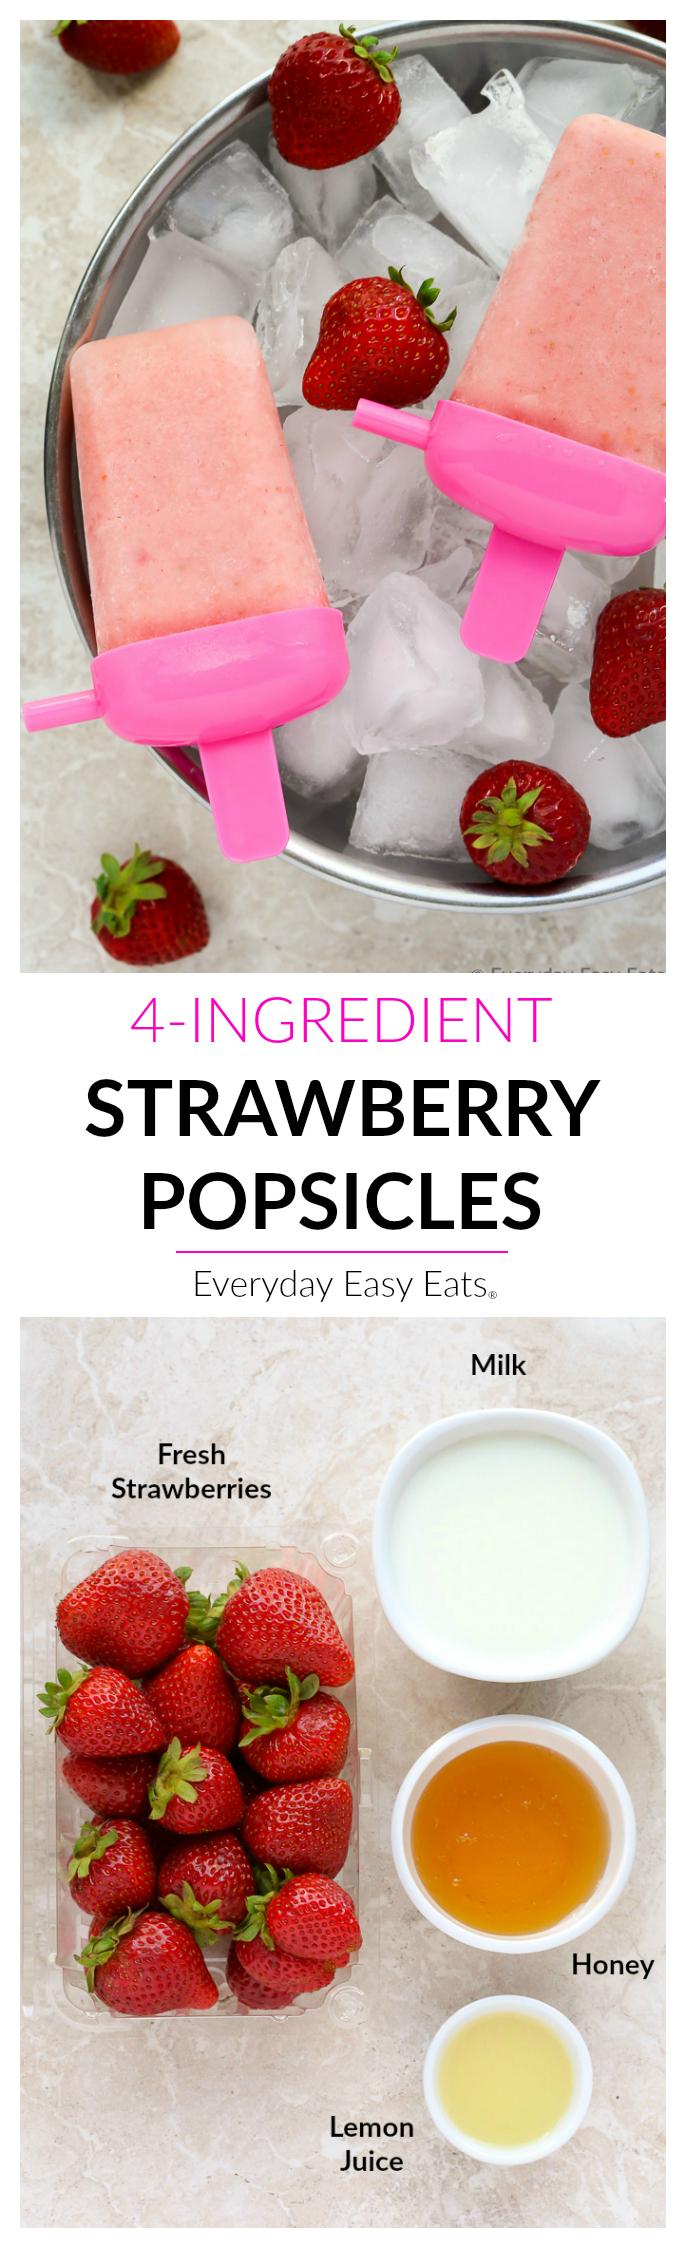 Healthy, 4-ingredient Strawberry Popsicles! | EverydayEasyEats.com